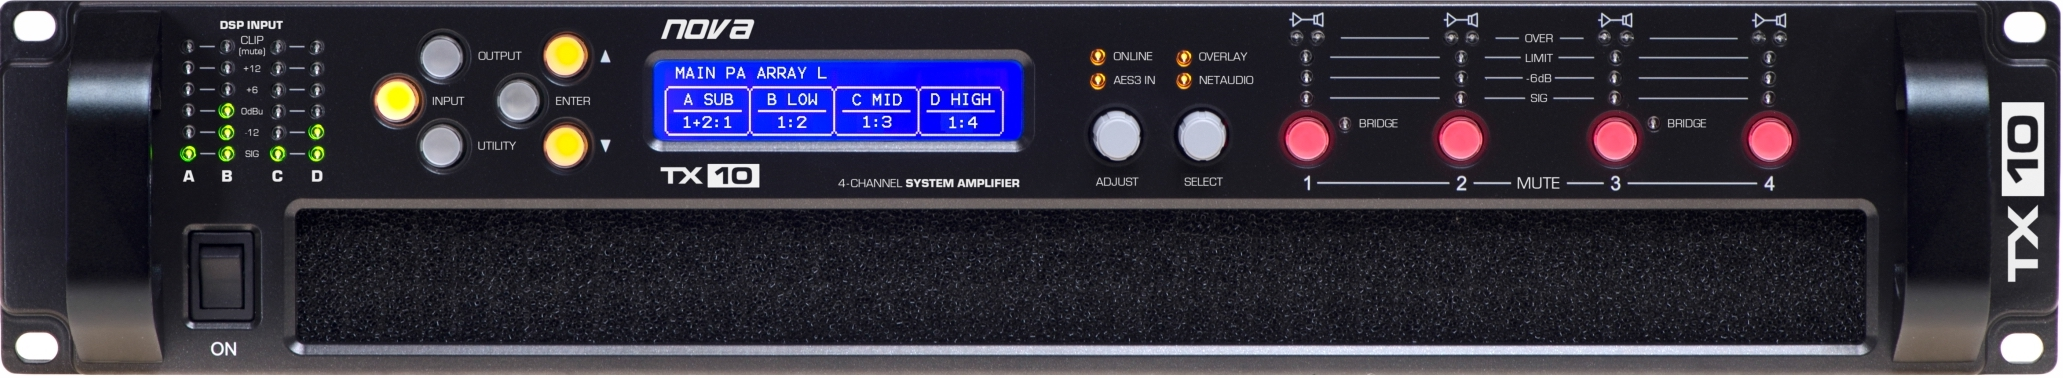 Nova TX10 D, 4-kanálový zesilovač, 10kW, DSP, DANTE FIR